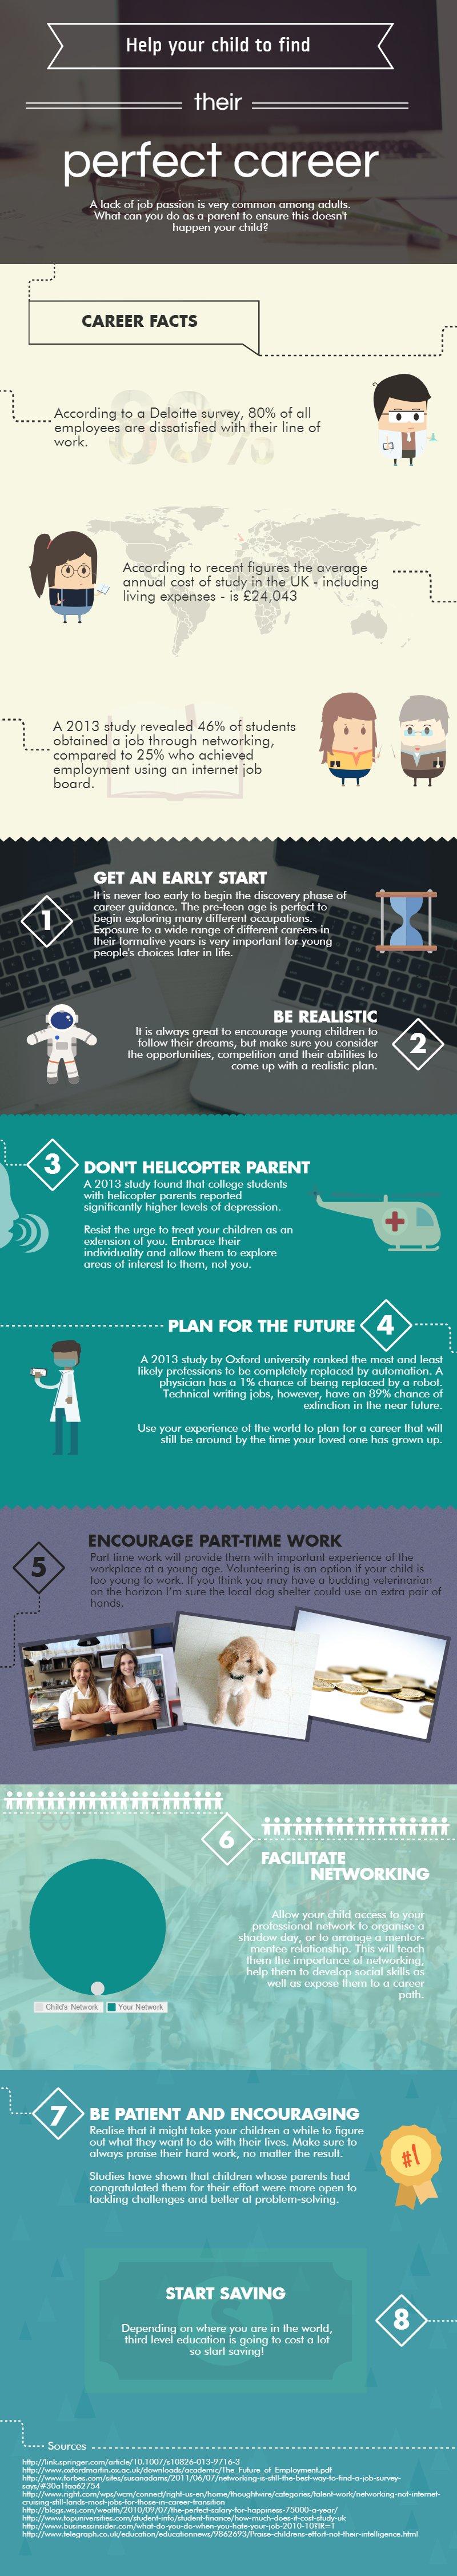 future careers for kids